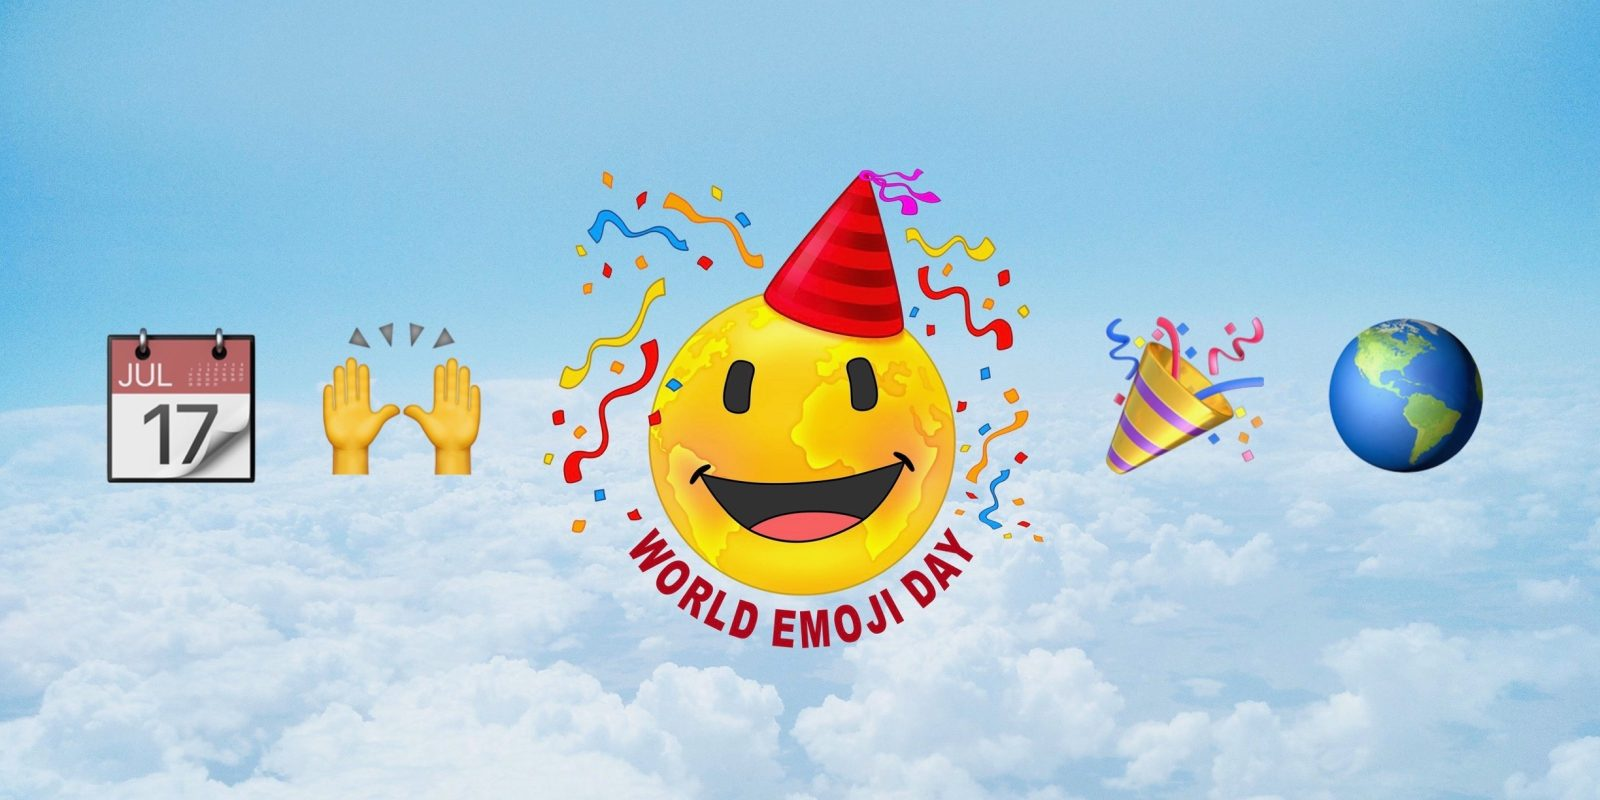 Roundup: World Emoji Day Awards, illustrated history of emojis, Ford's pickup truck emoji, more